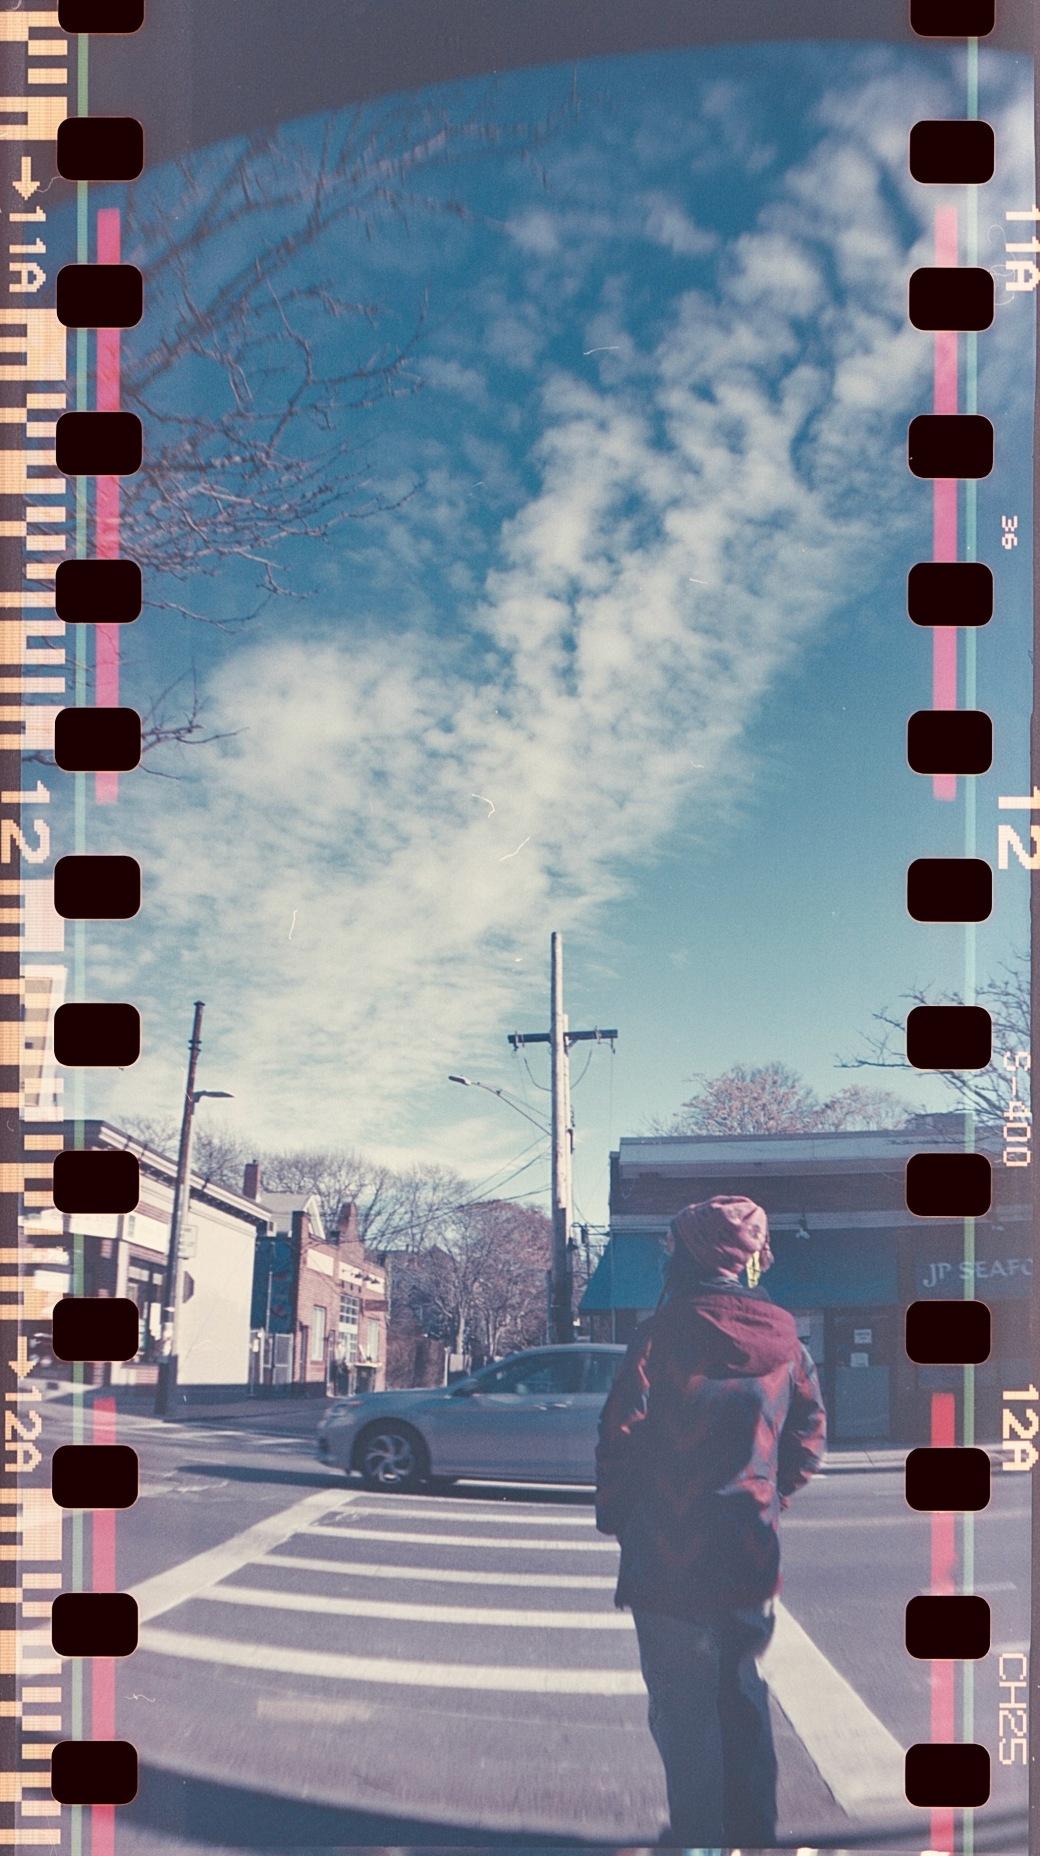 massachusetts jamaica plain centre street sprocket rocket photography fuji 400 sprocket holes 2